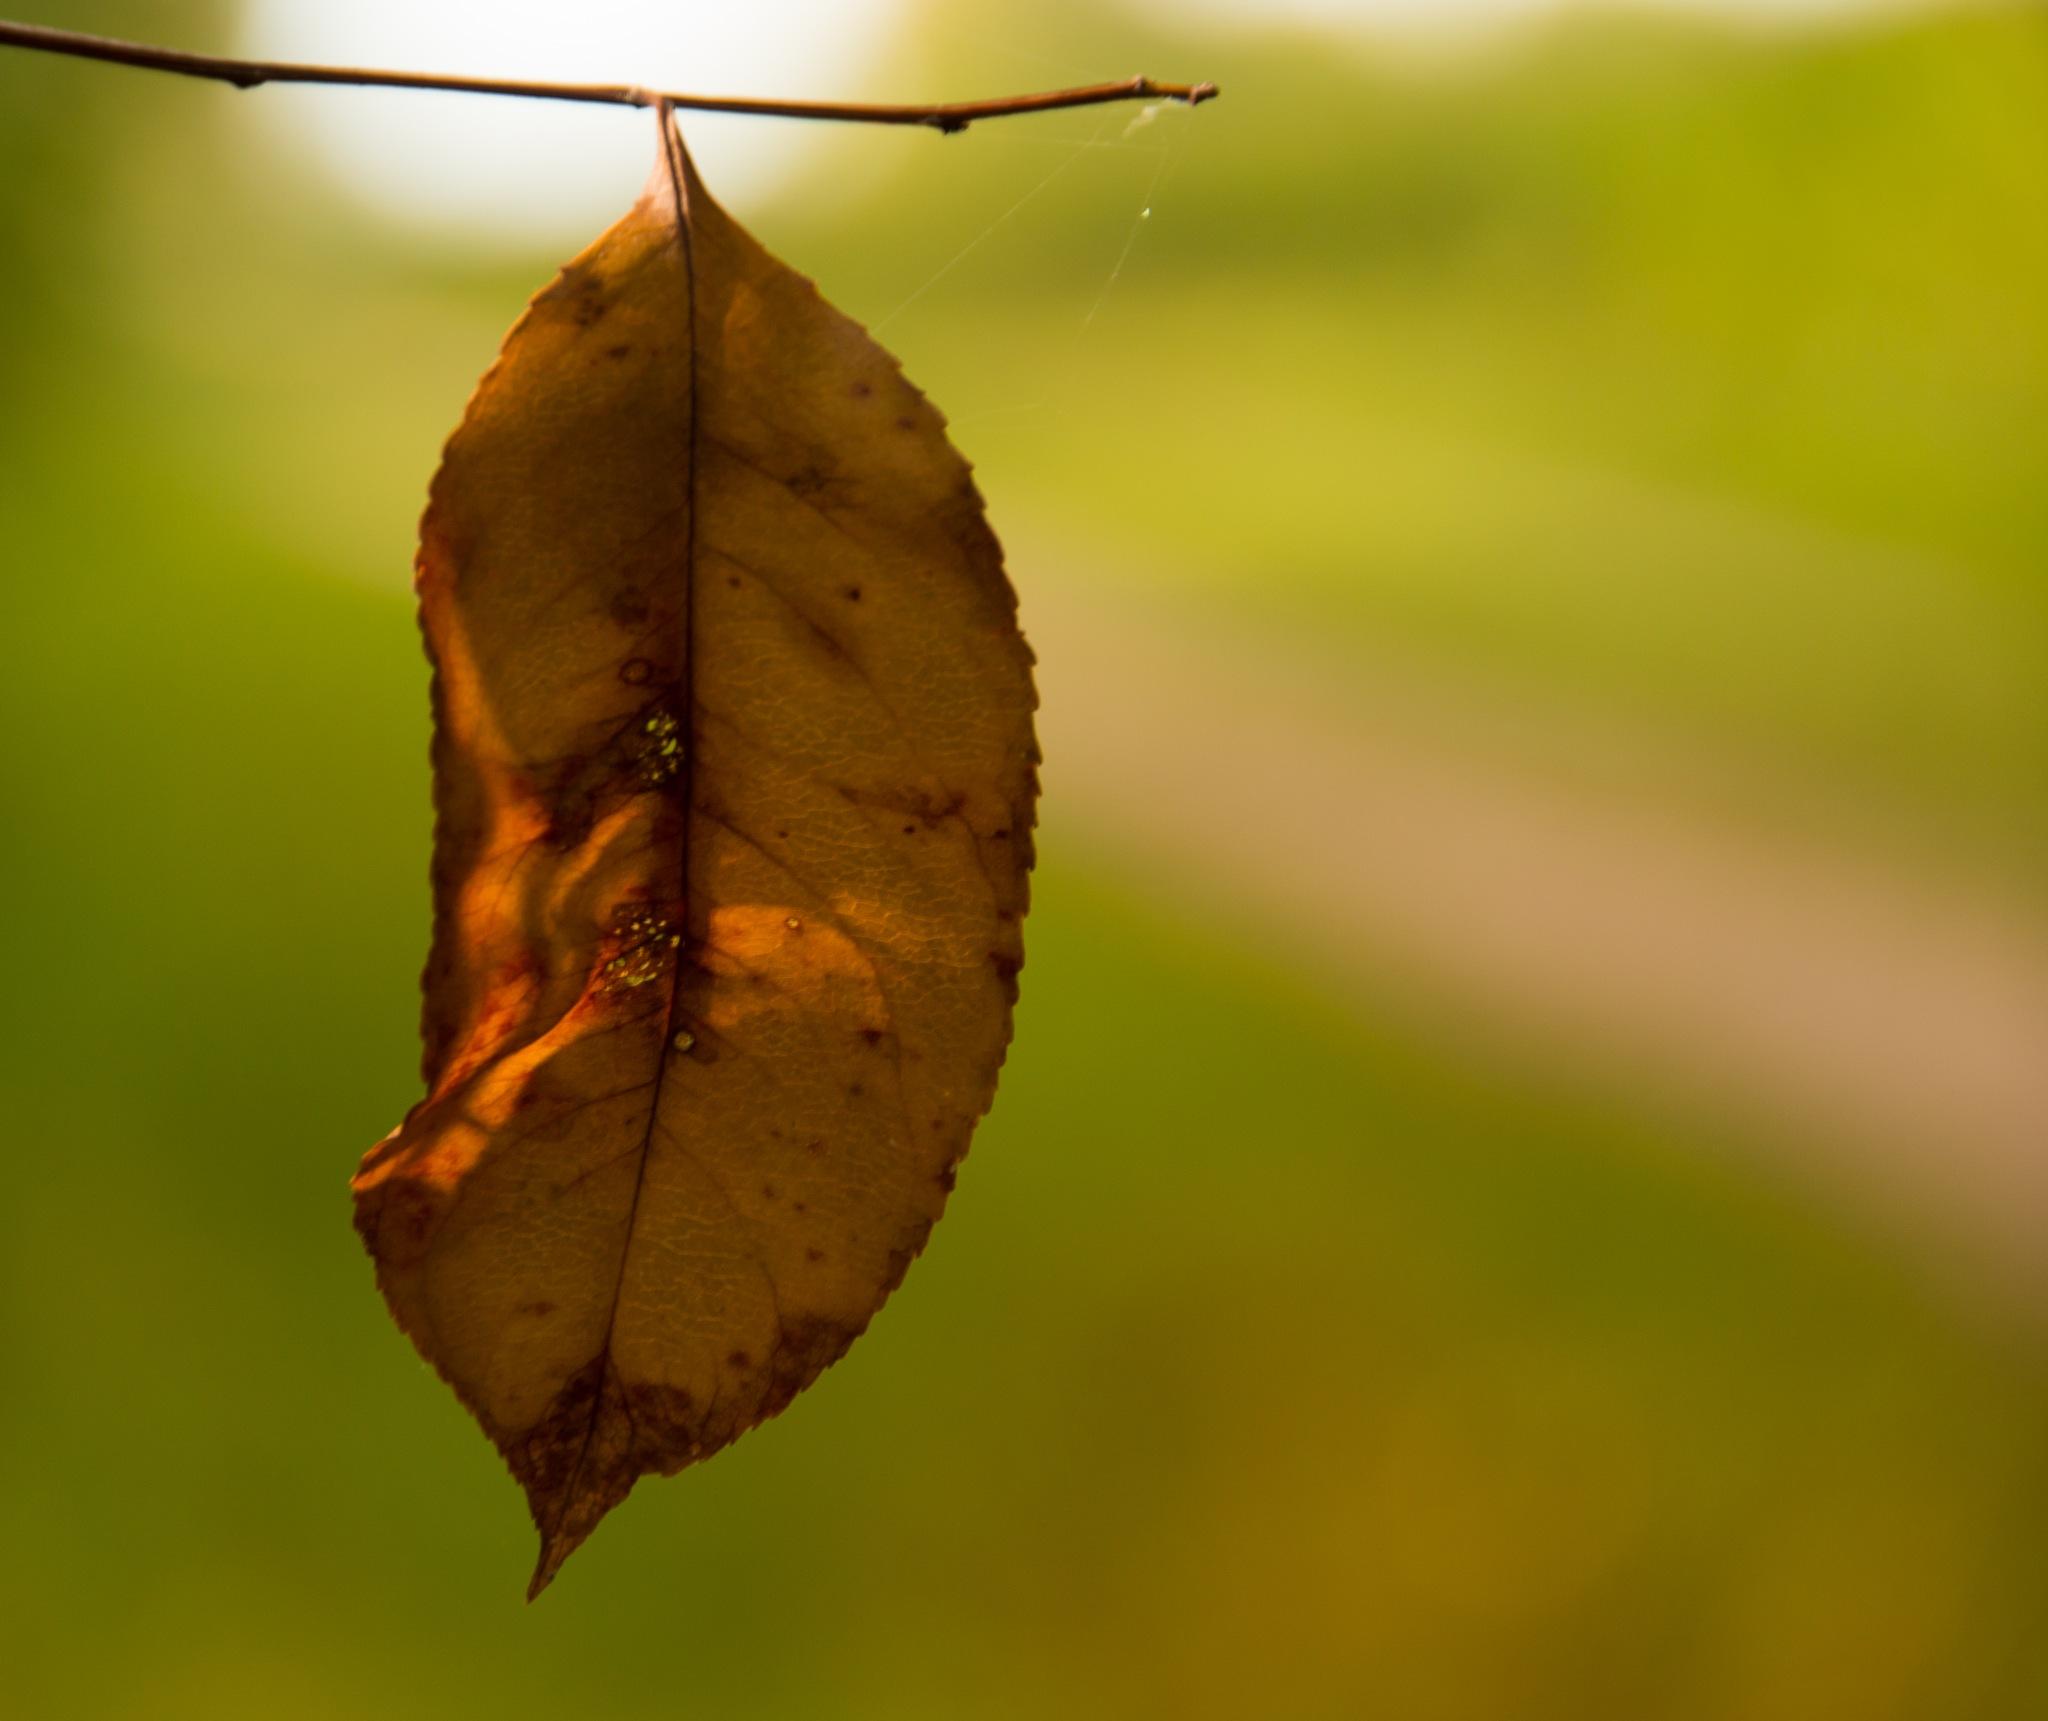 Leaf by Hans Lunenborg